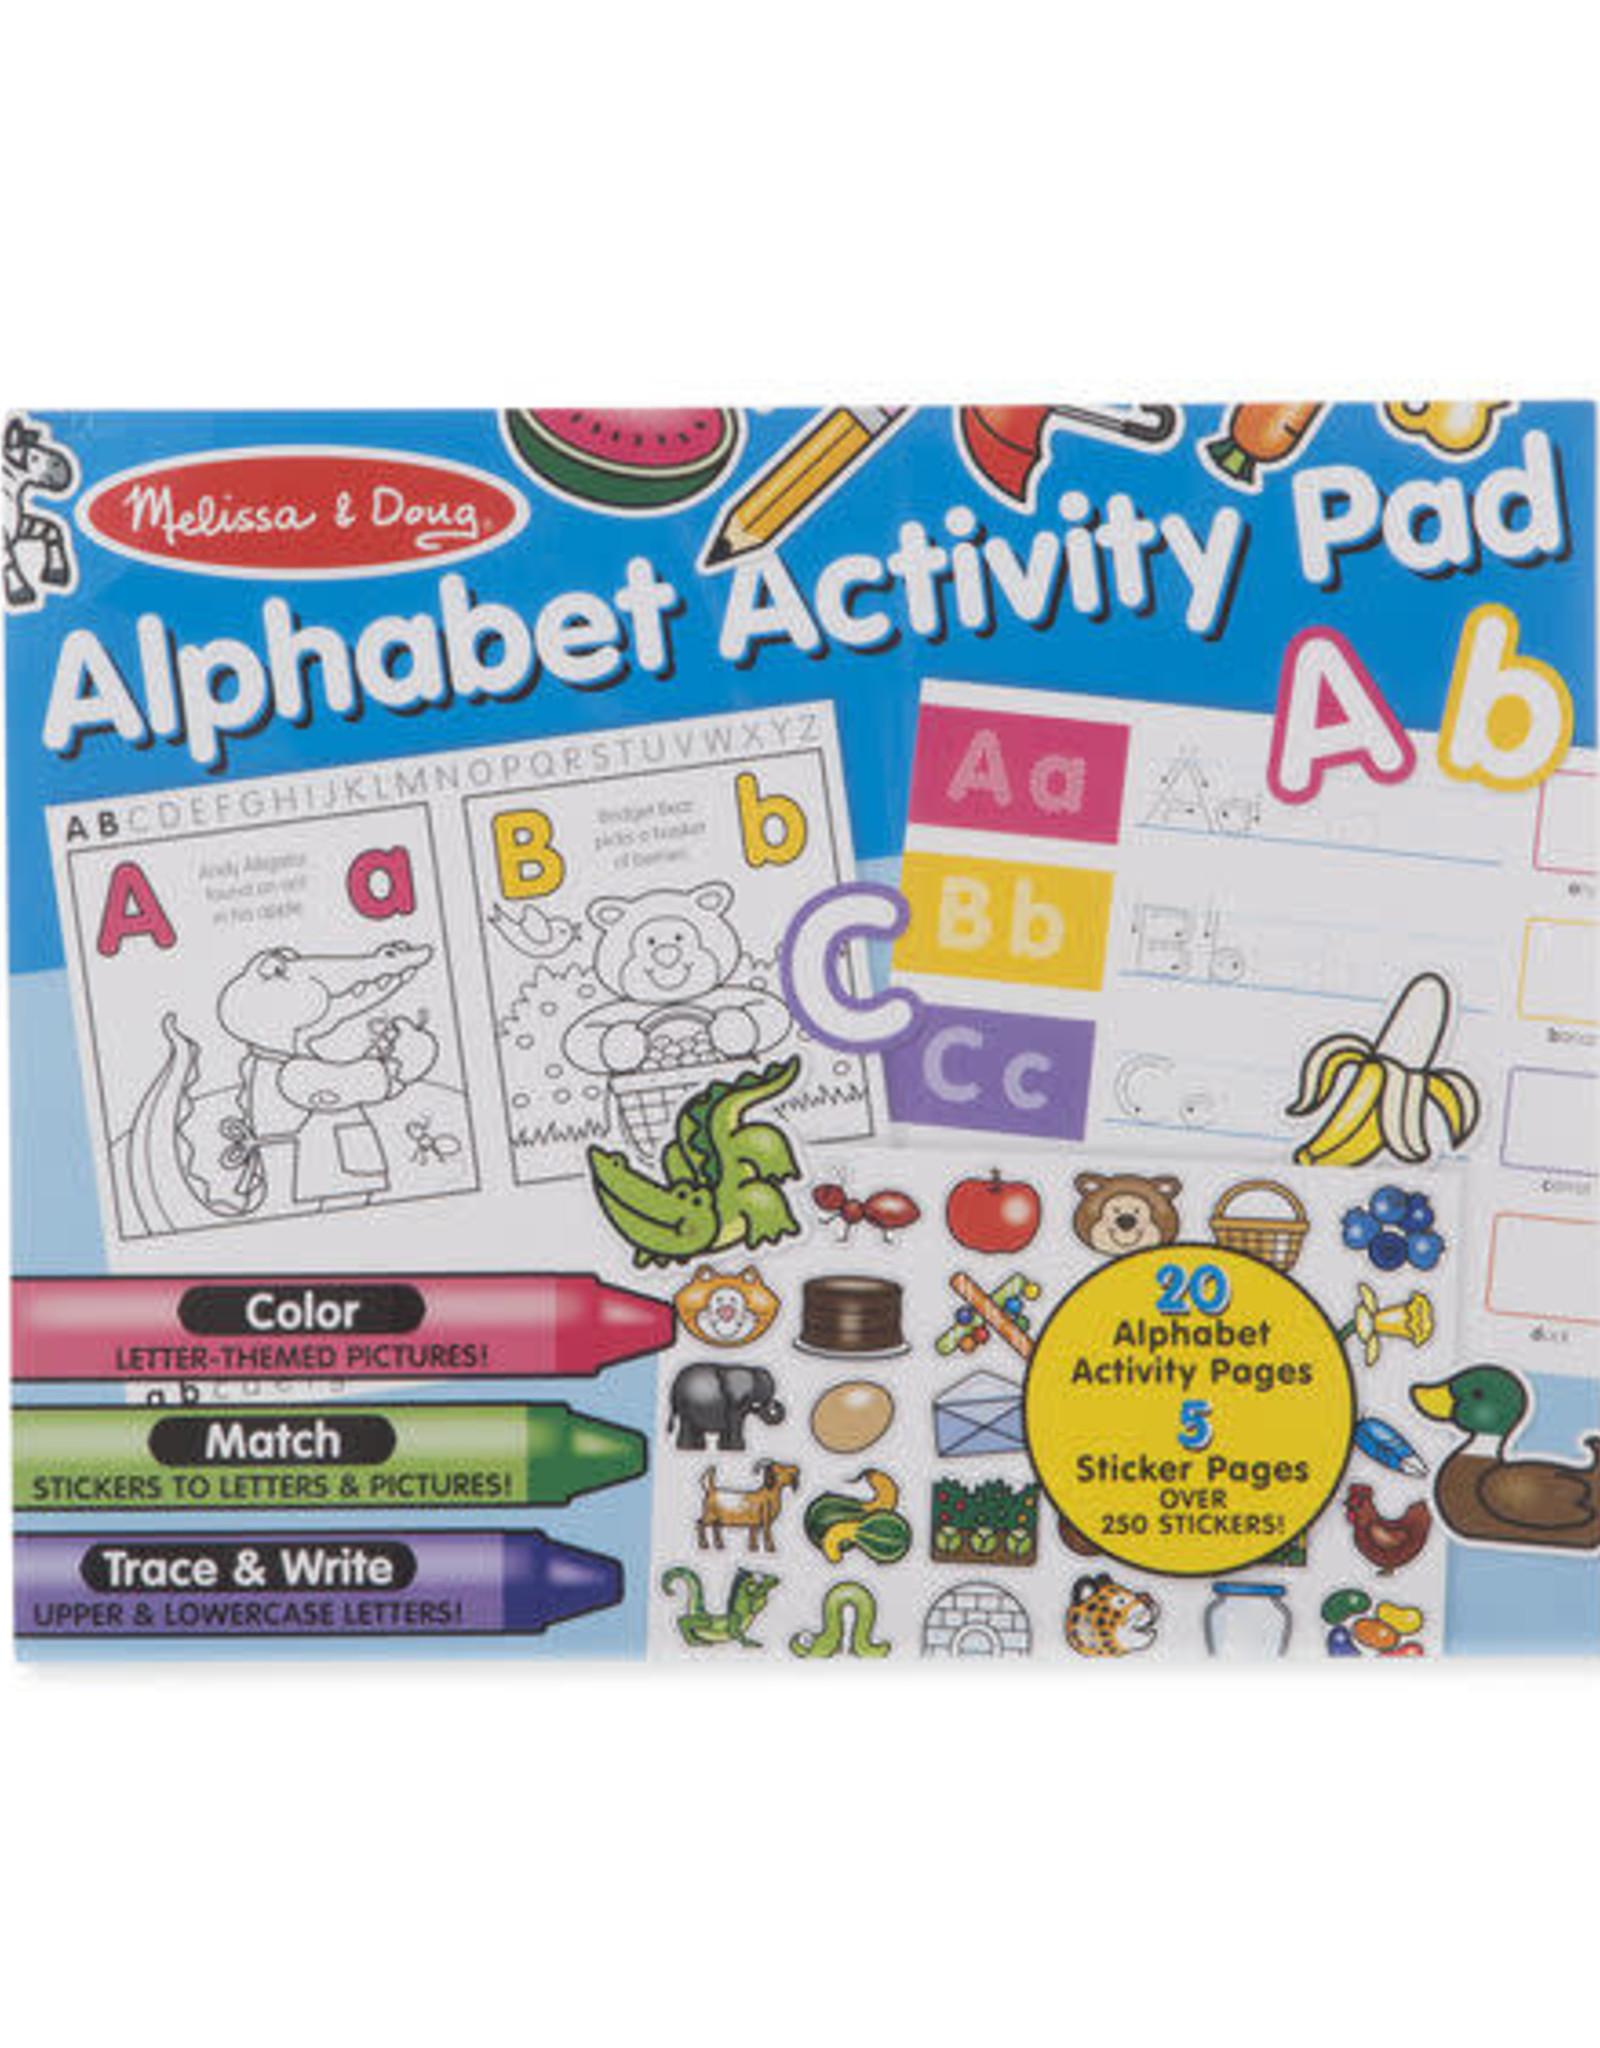 Melissa & Doug MD Activity Pad Alphabet